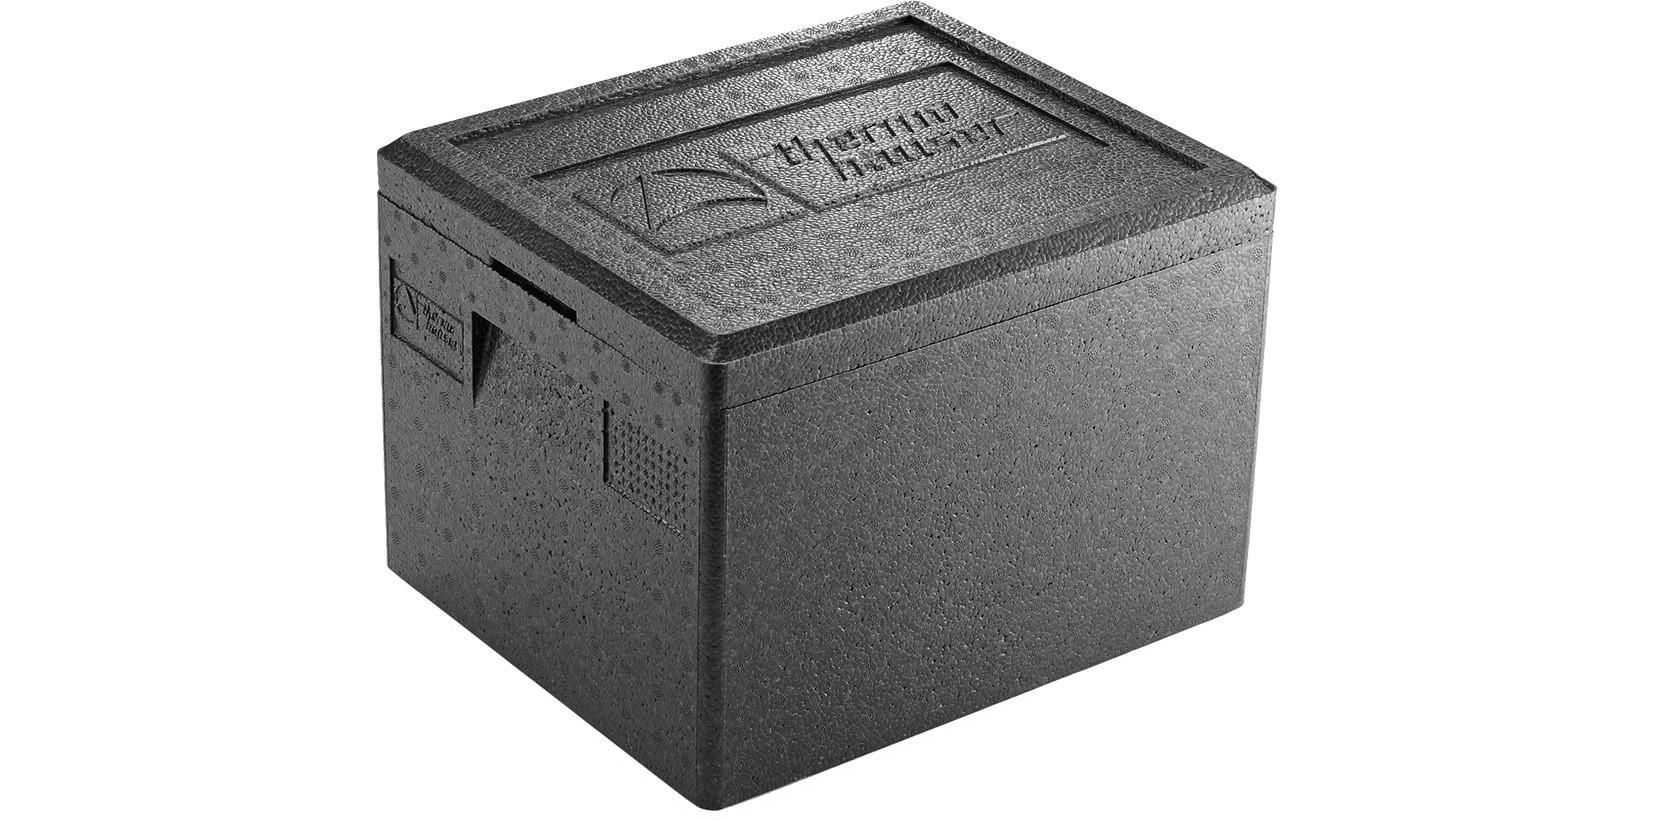 EPP-Box GN 1/2 / 10,00 l / 390 x 330 x 180 mm / schwarz